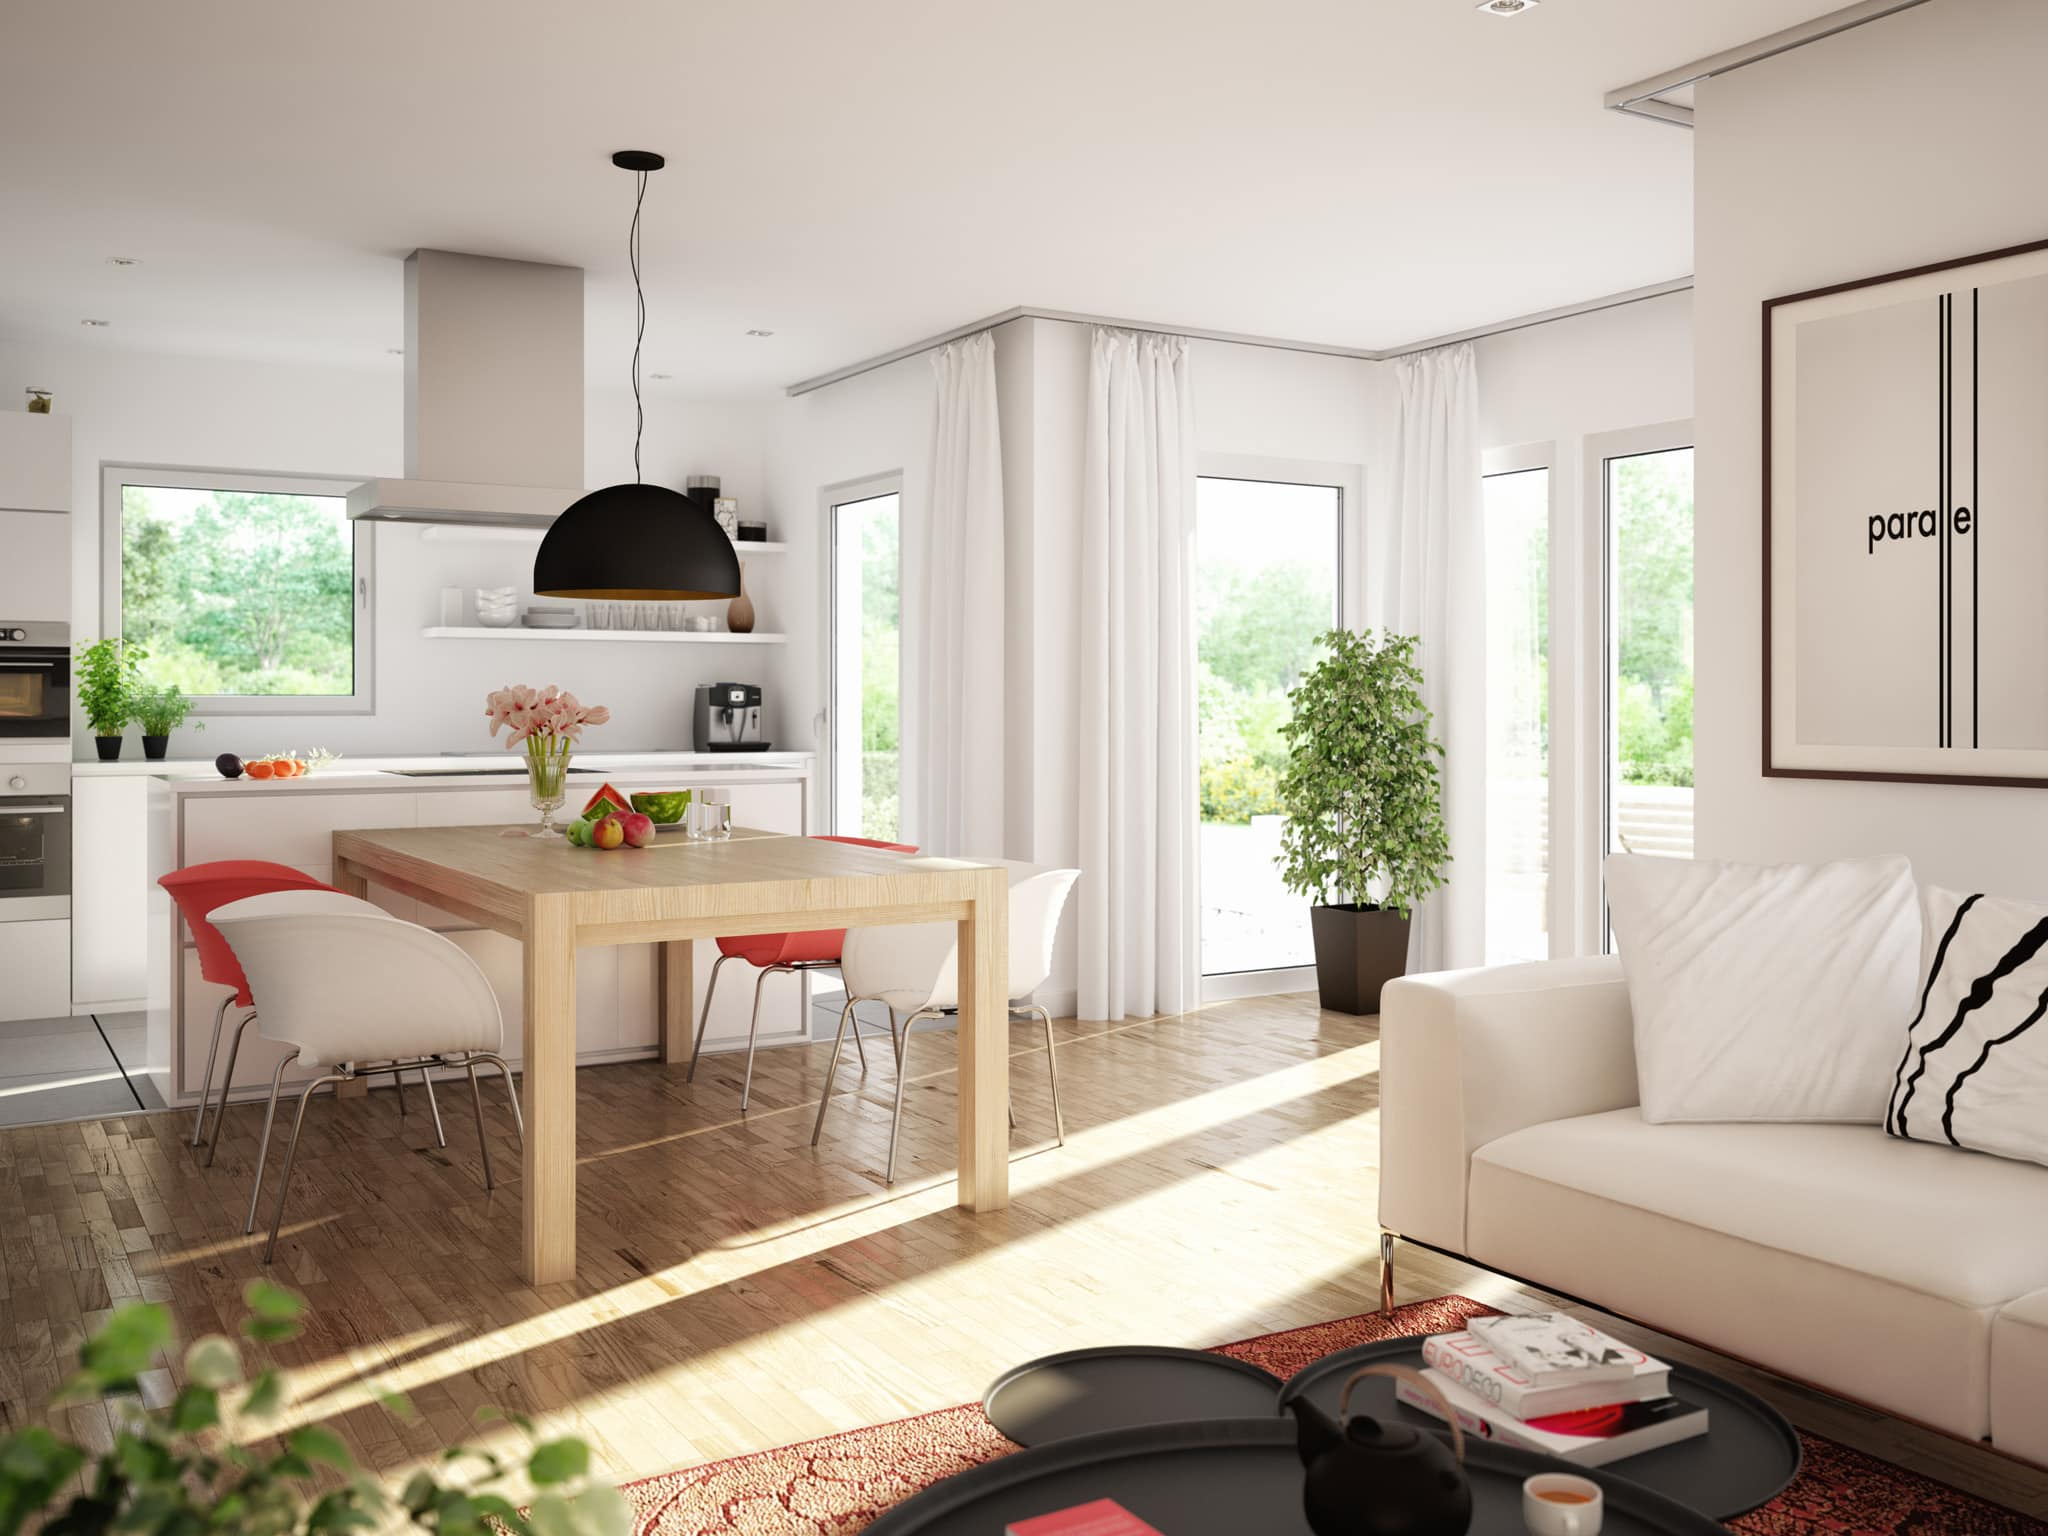 Wohnküche - Ideen Inneneinrichtung Einfamilienhaus Living Haus SUNSHINE 125 V5 - HausbauDirekt.de